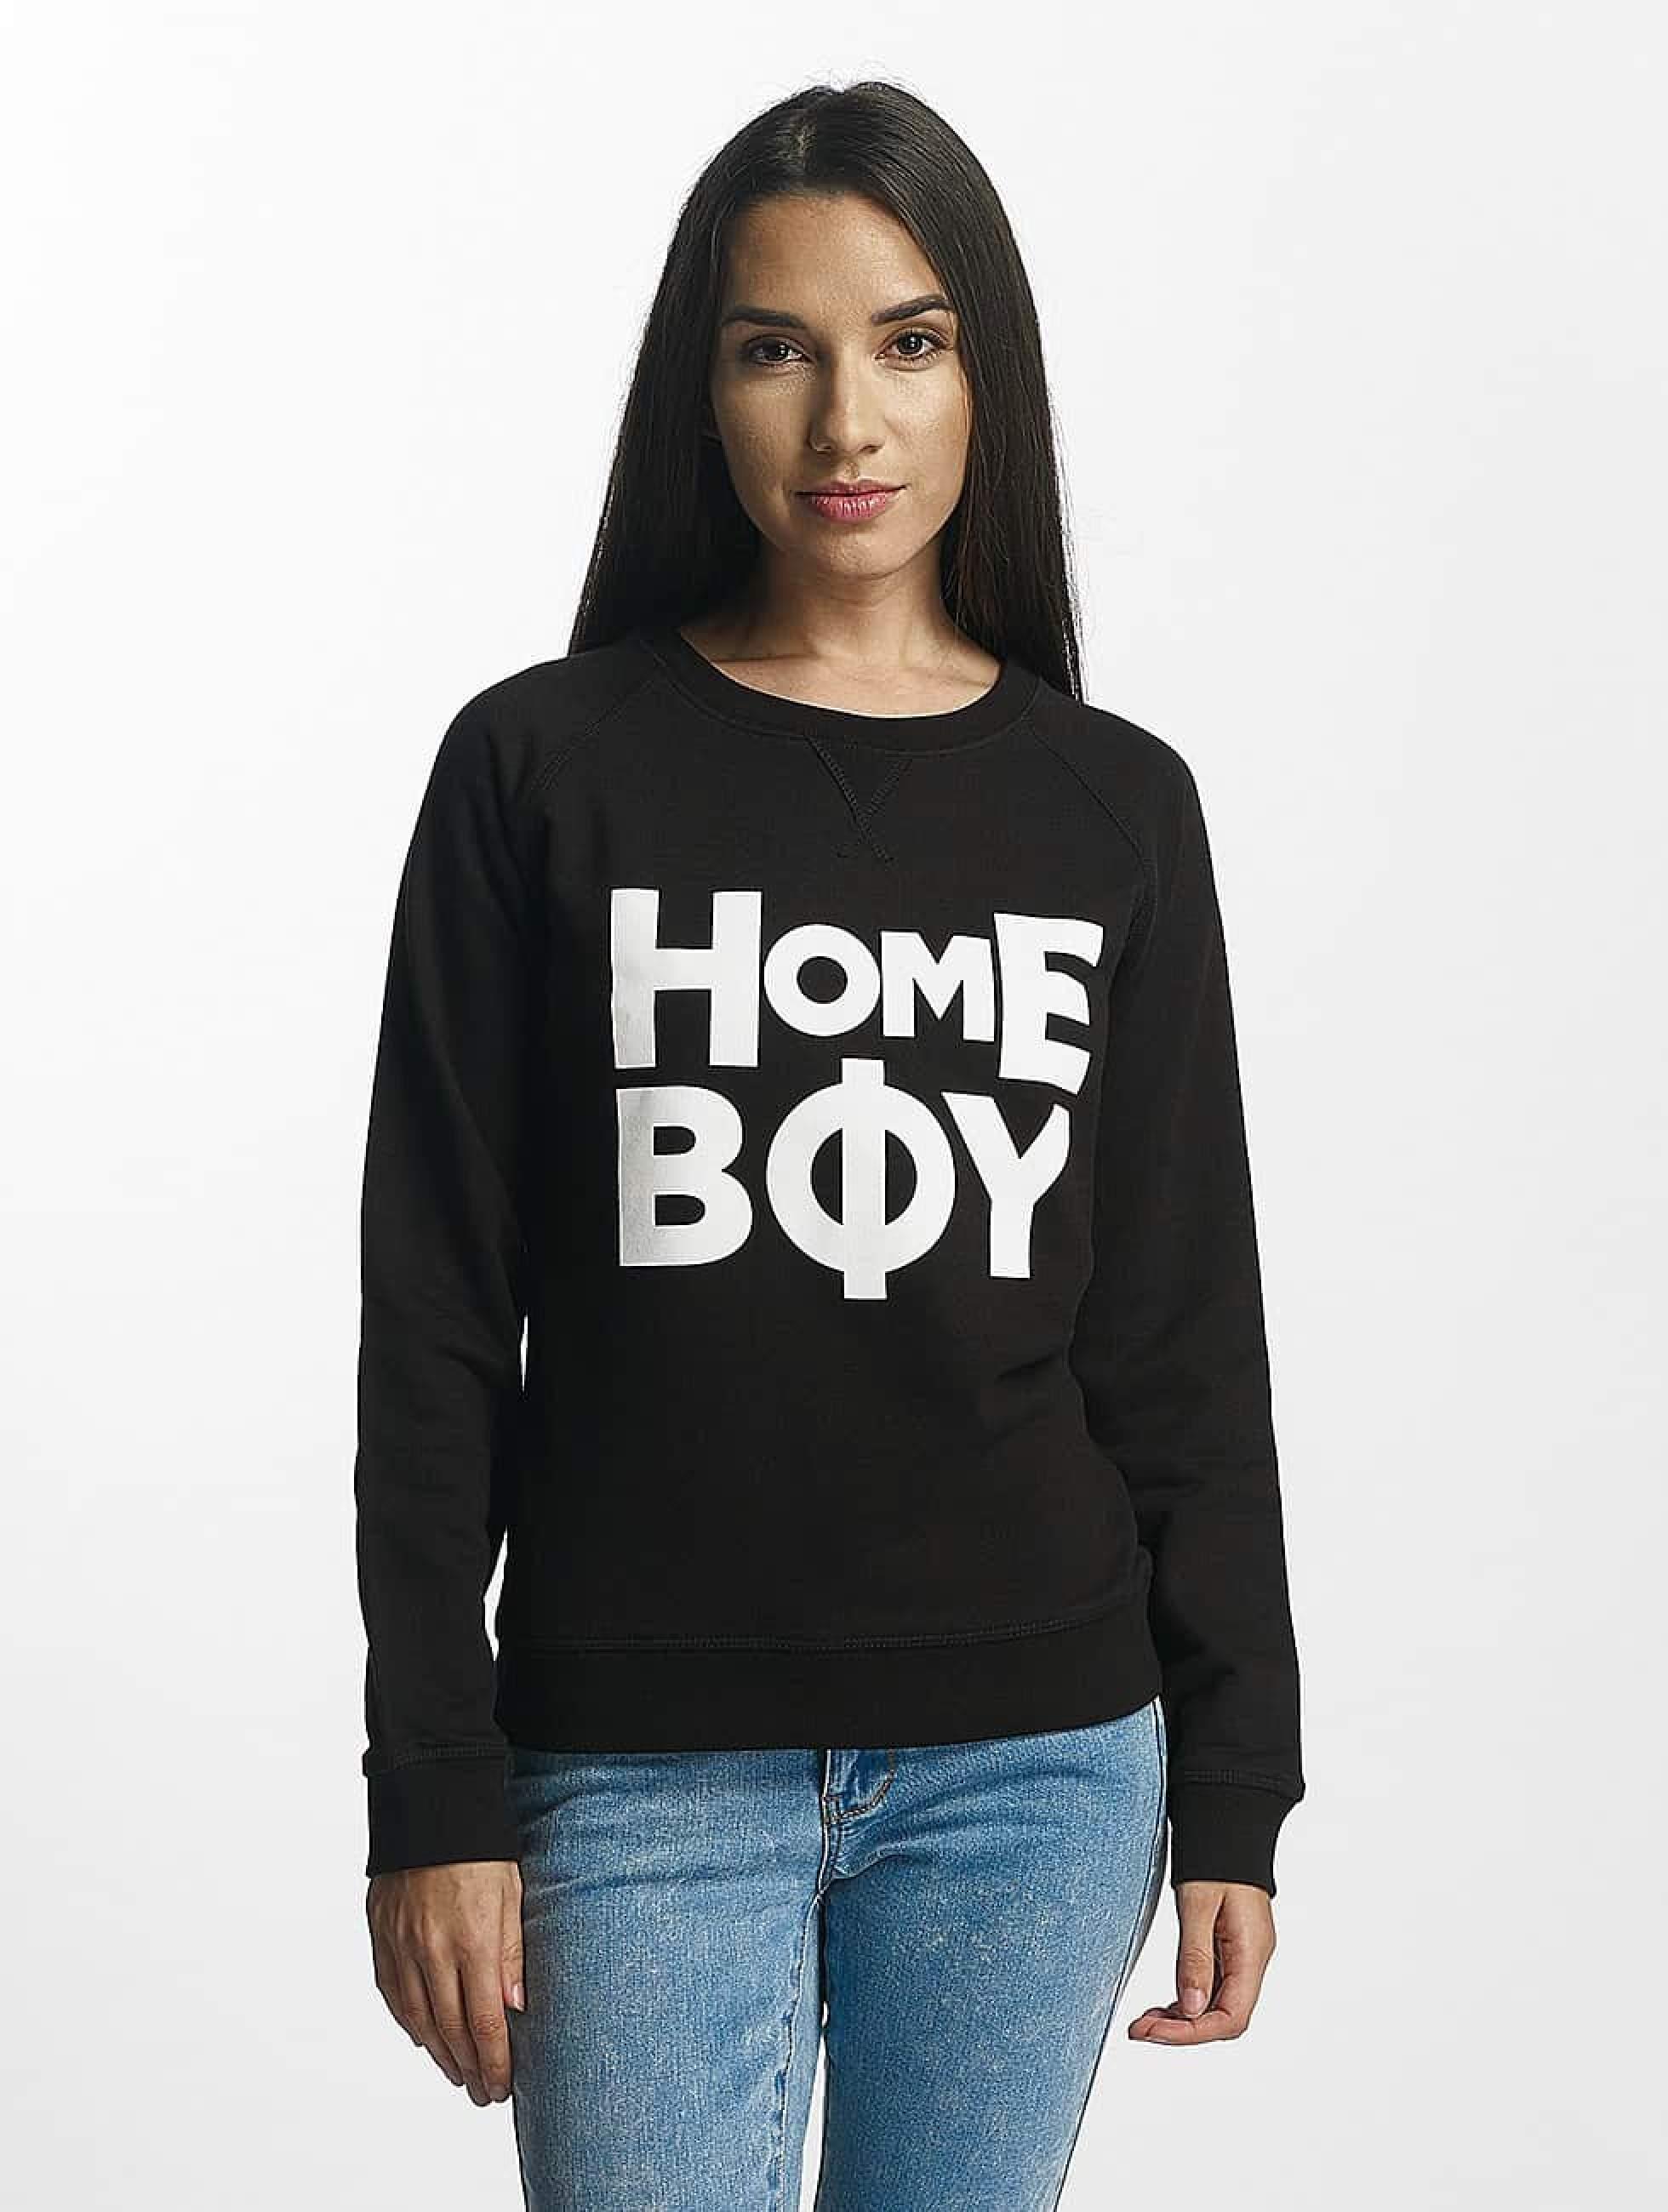 Sweatshirt Homeboy Homeboy Black Sweatshirt Black Homeboy Black Homeboy Sweatshirt Berlin Berlin Berlin Berlin Sweatshirt doexCB